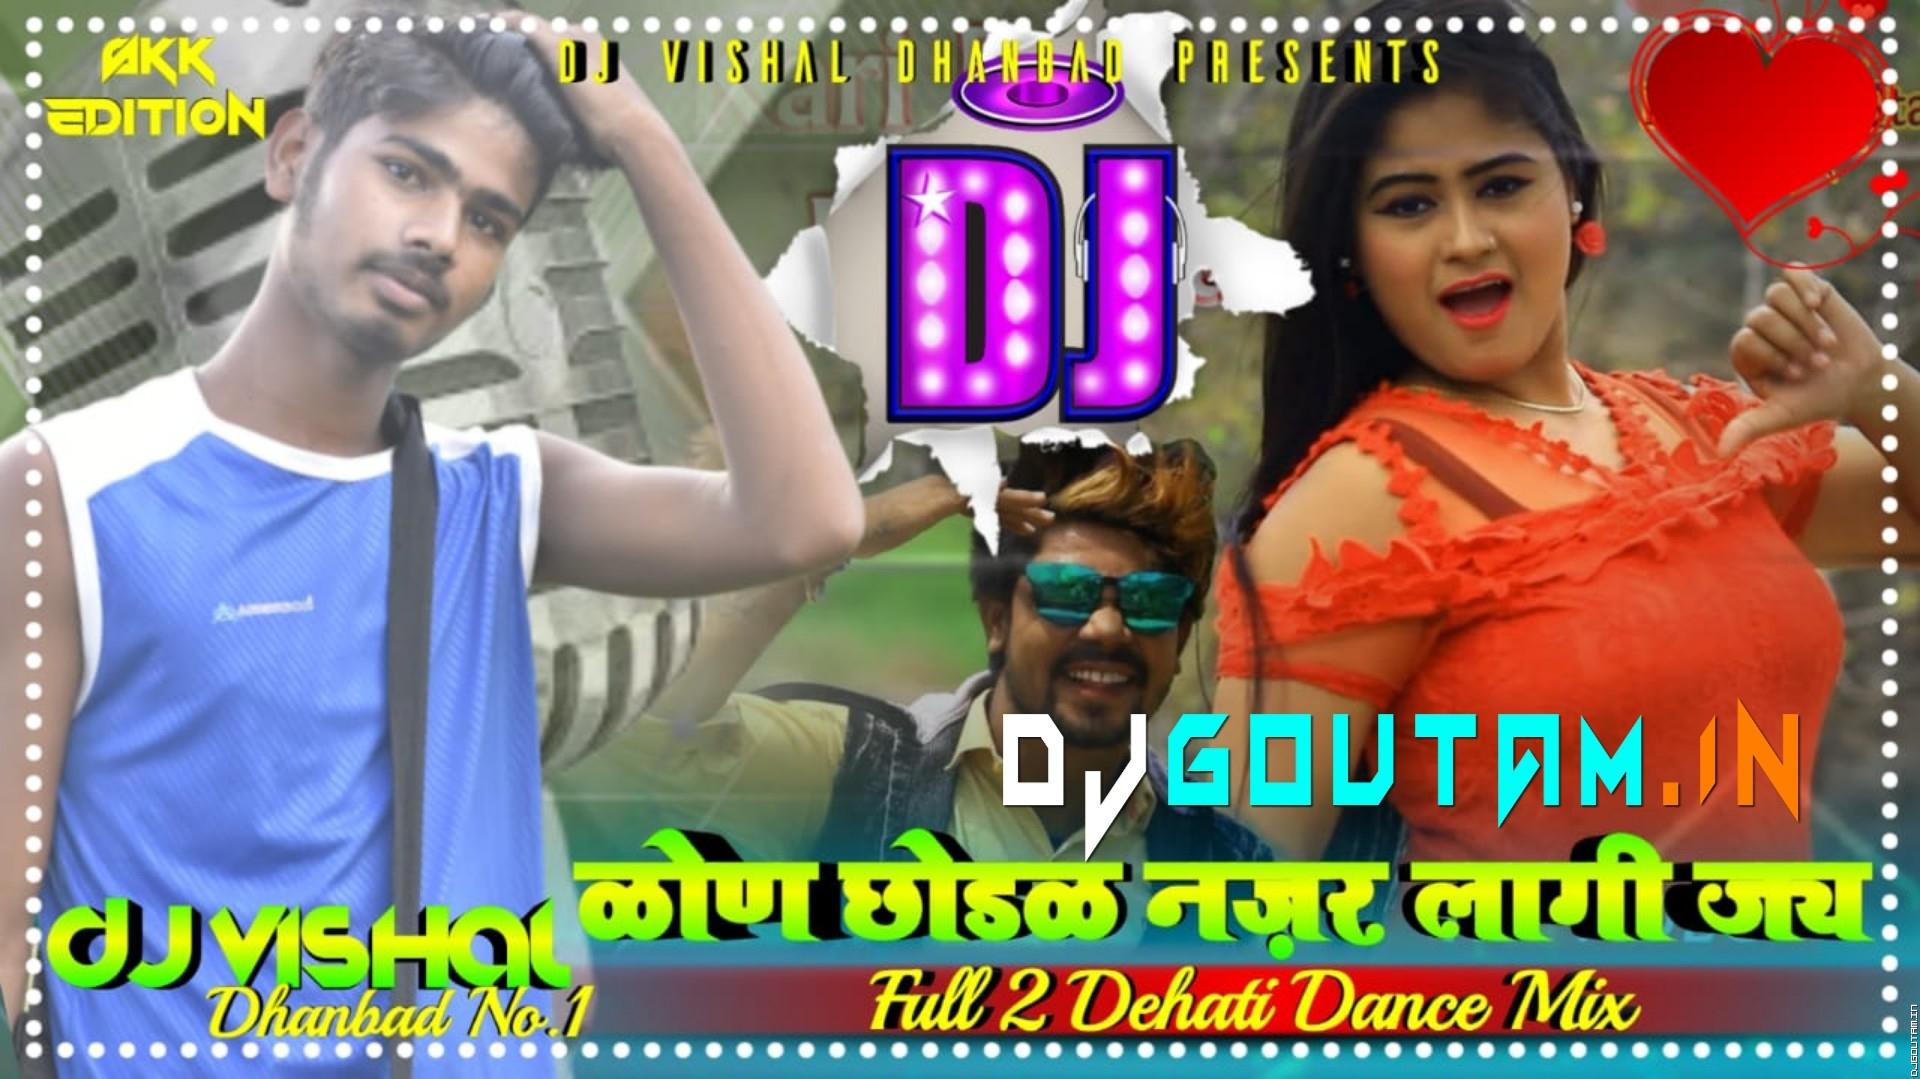 Nachenge Nachenge Bola Ji Tere Dar Pe(Bol Bam Hard Dance Mix)Dj RaHul Dhanbad.mp3